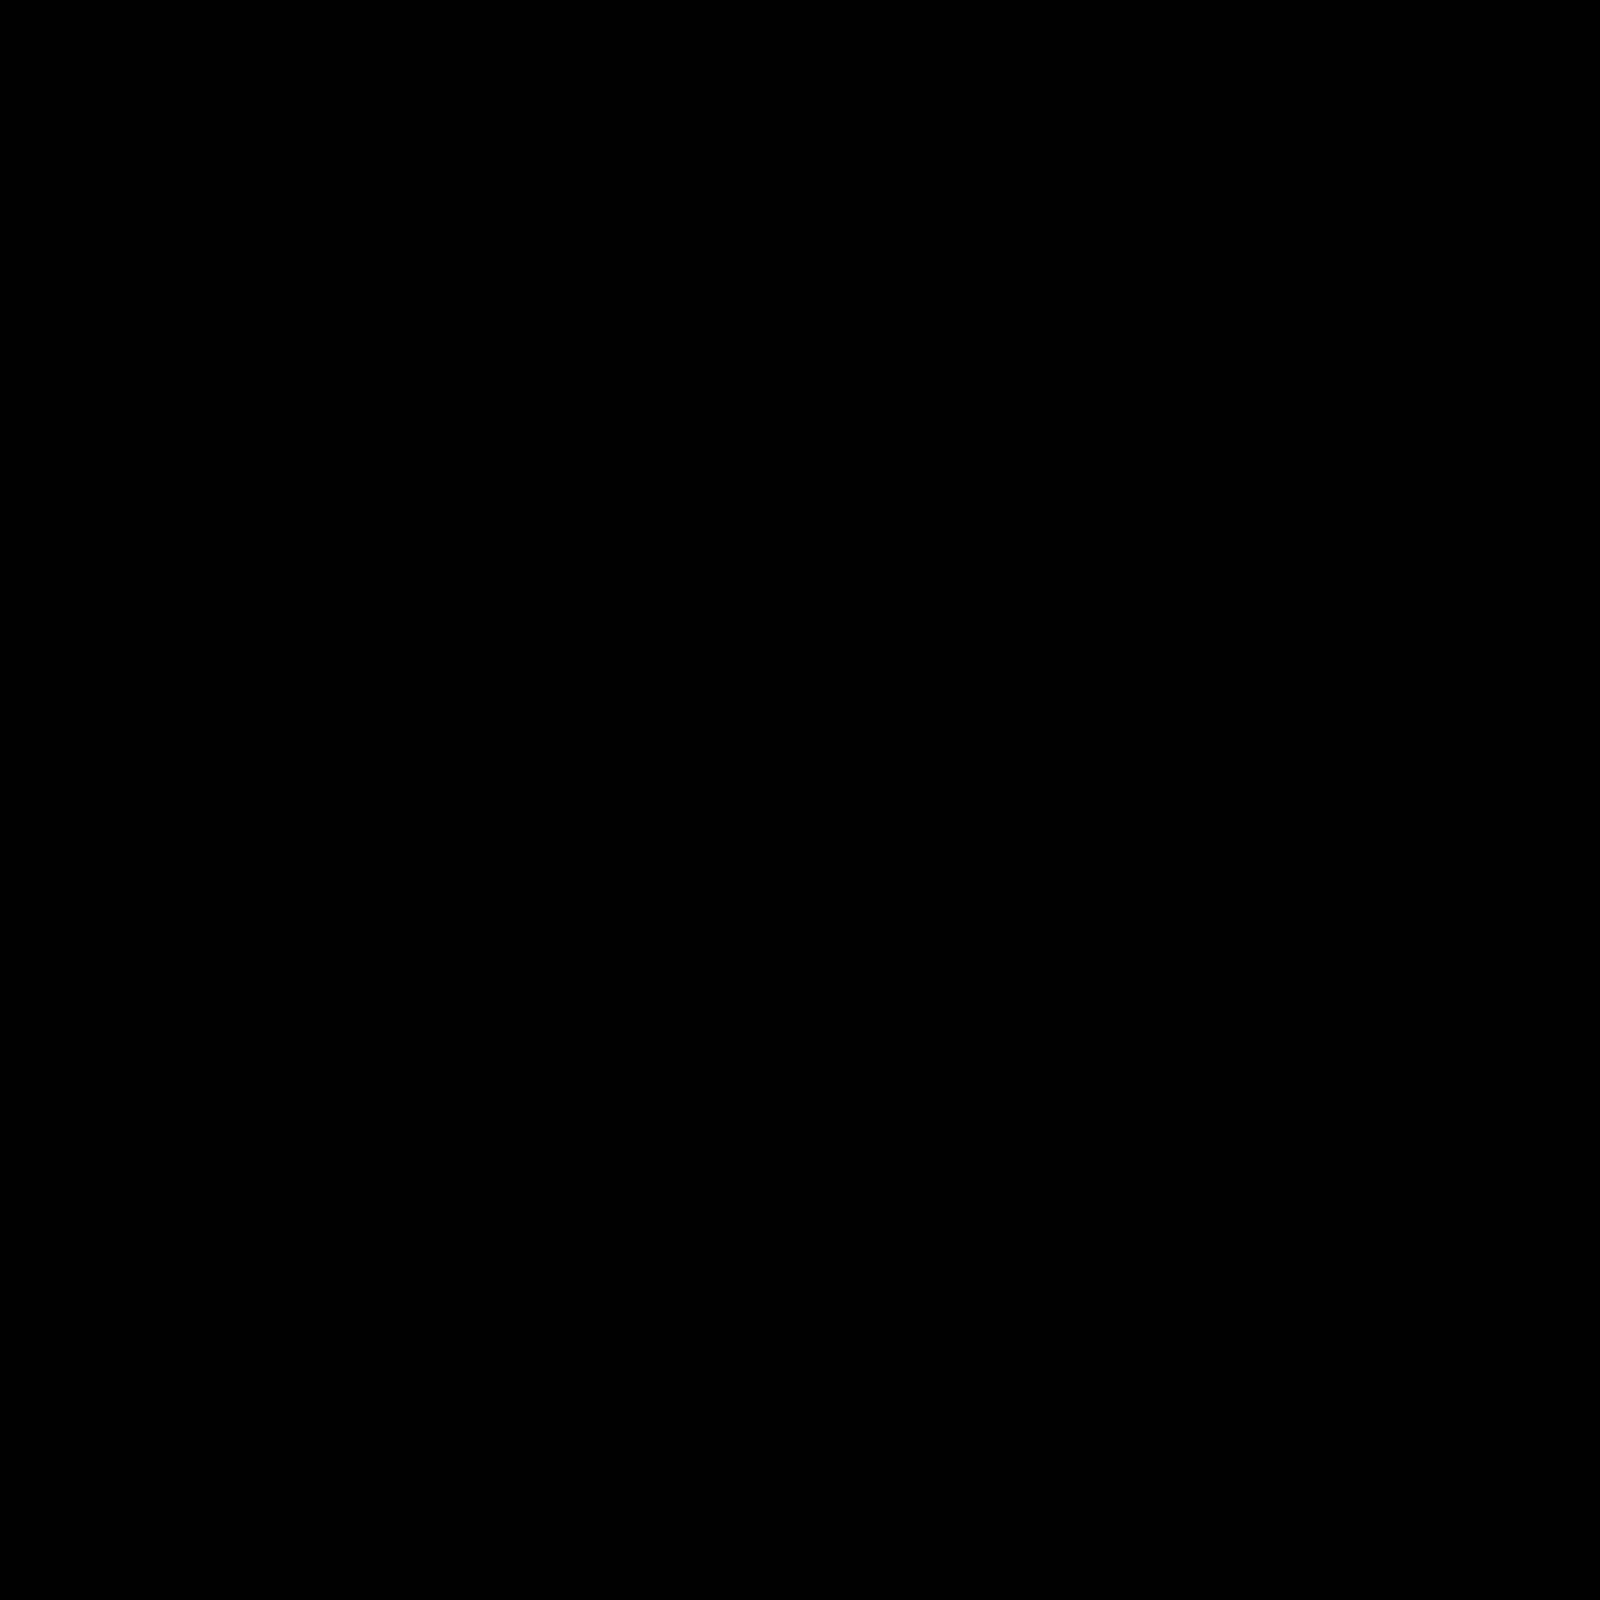 One-Pocket Folder Filled icon